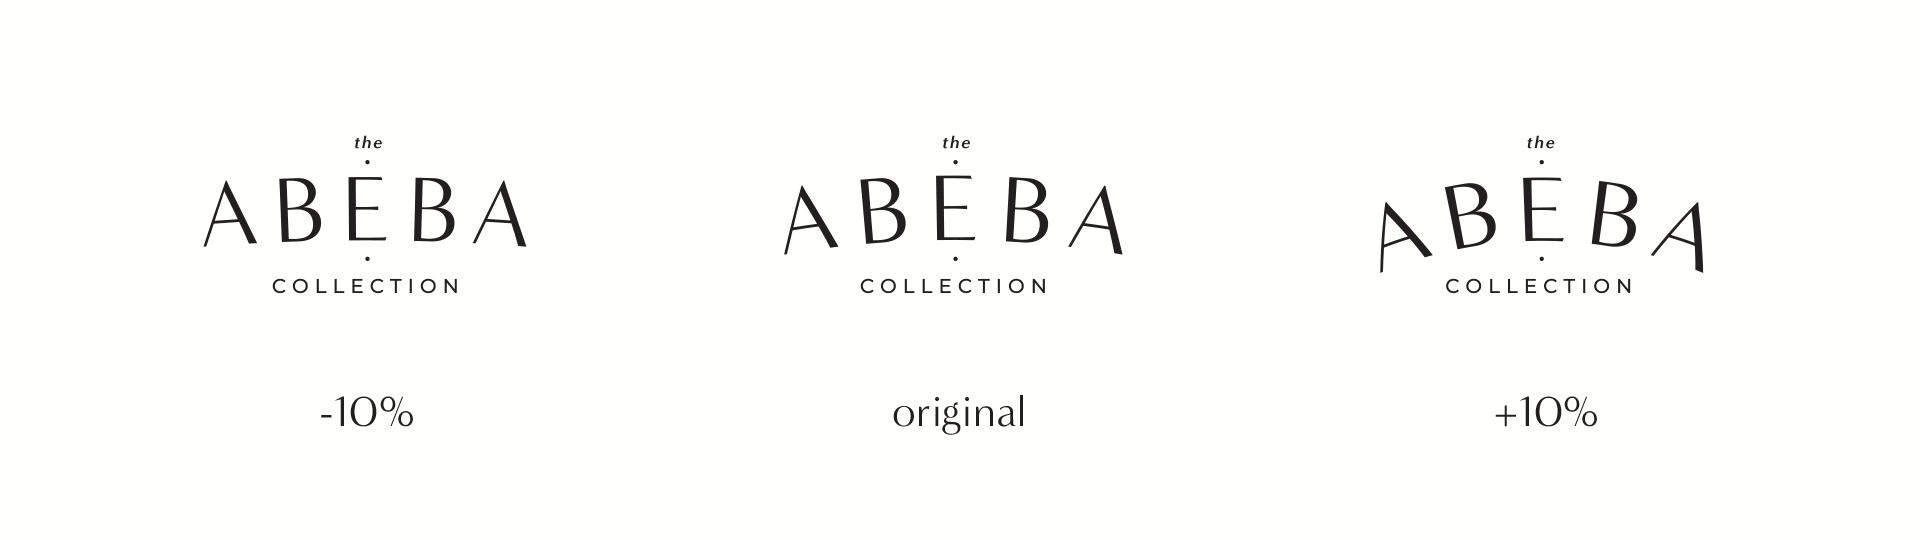 abeba02-markarch.png